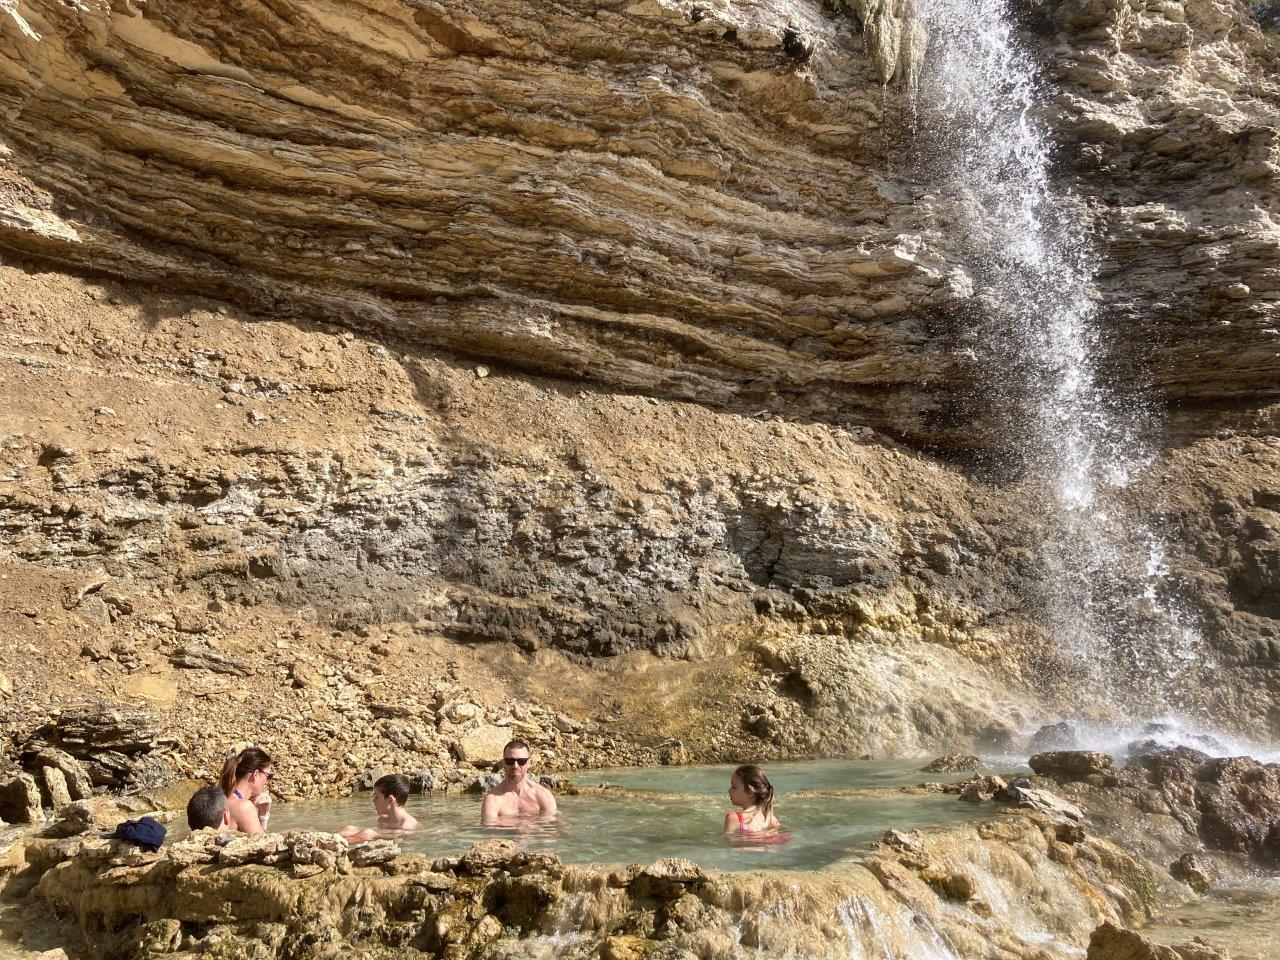 Waterfall hot springs Fairmont BC